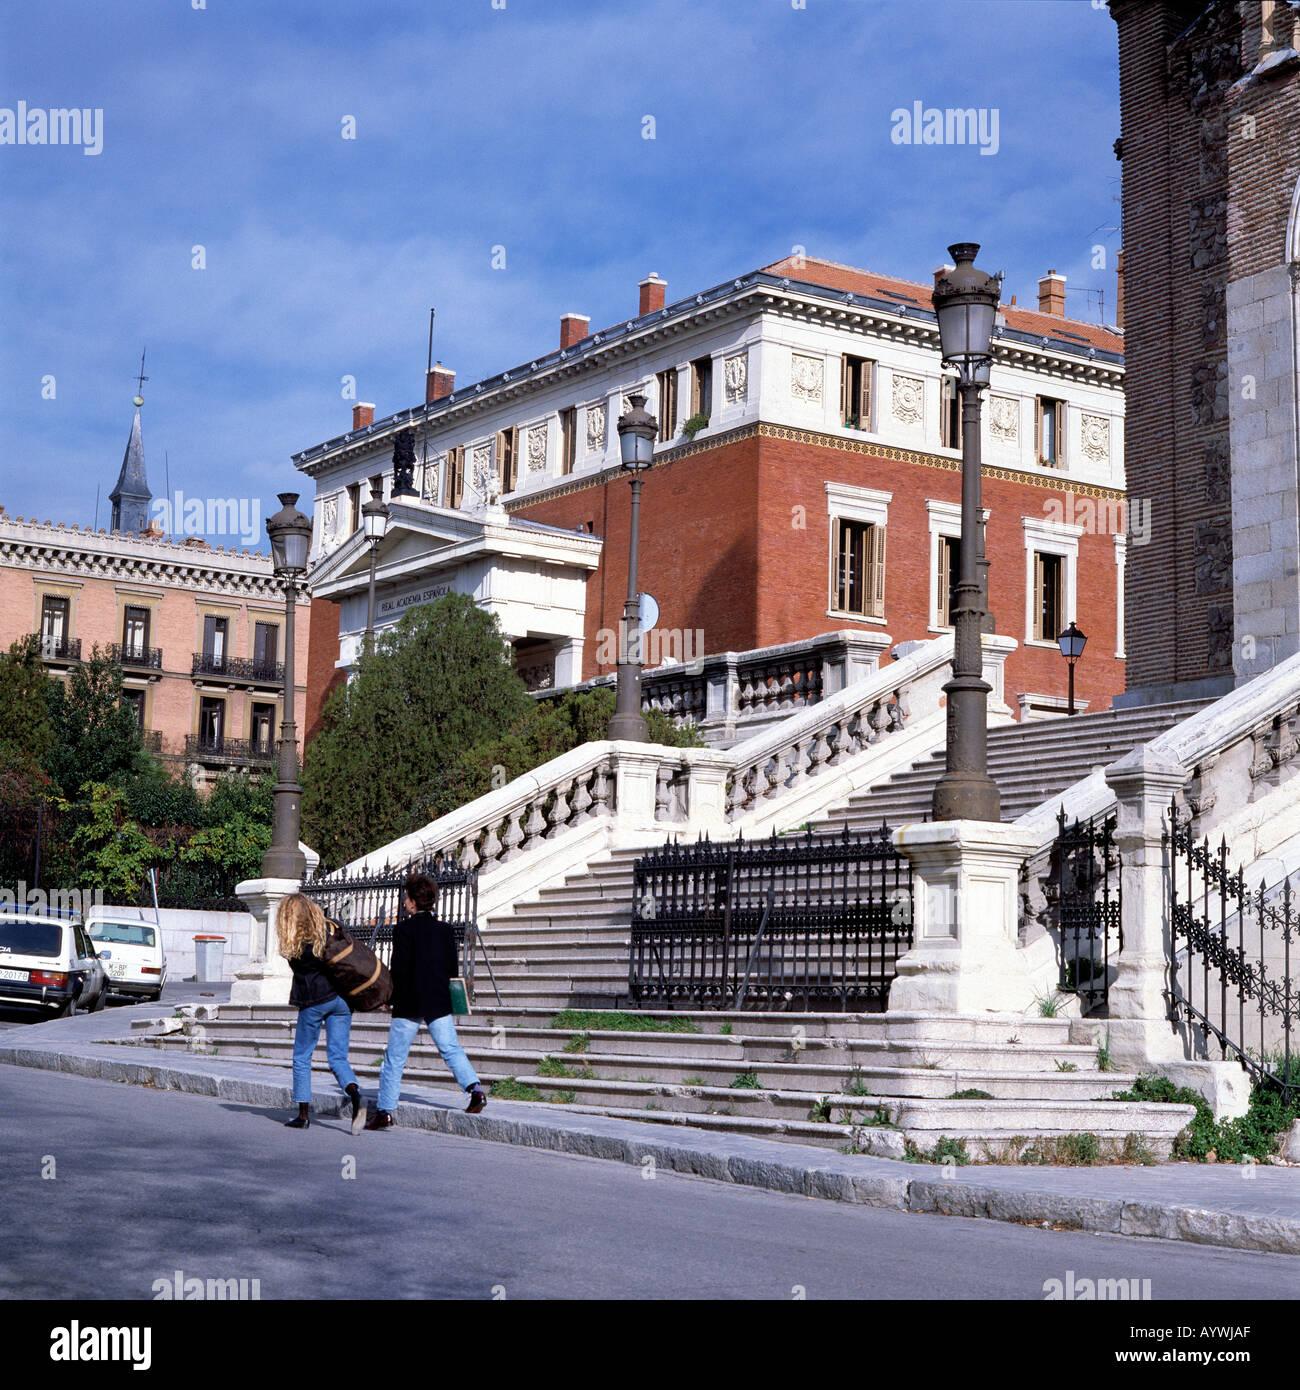 Real Academia Espanola, Koenigliche Akademie, Barocktreppe der Kirche San Jeronimo el Real, Madrid - Stock Image